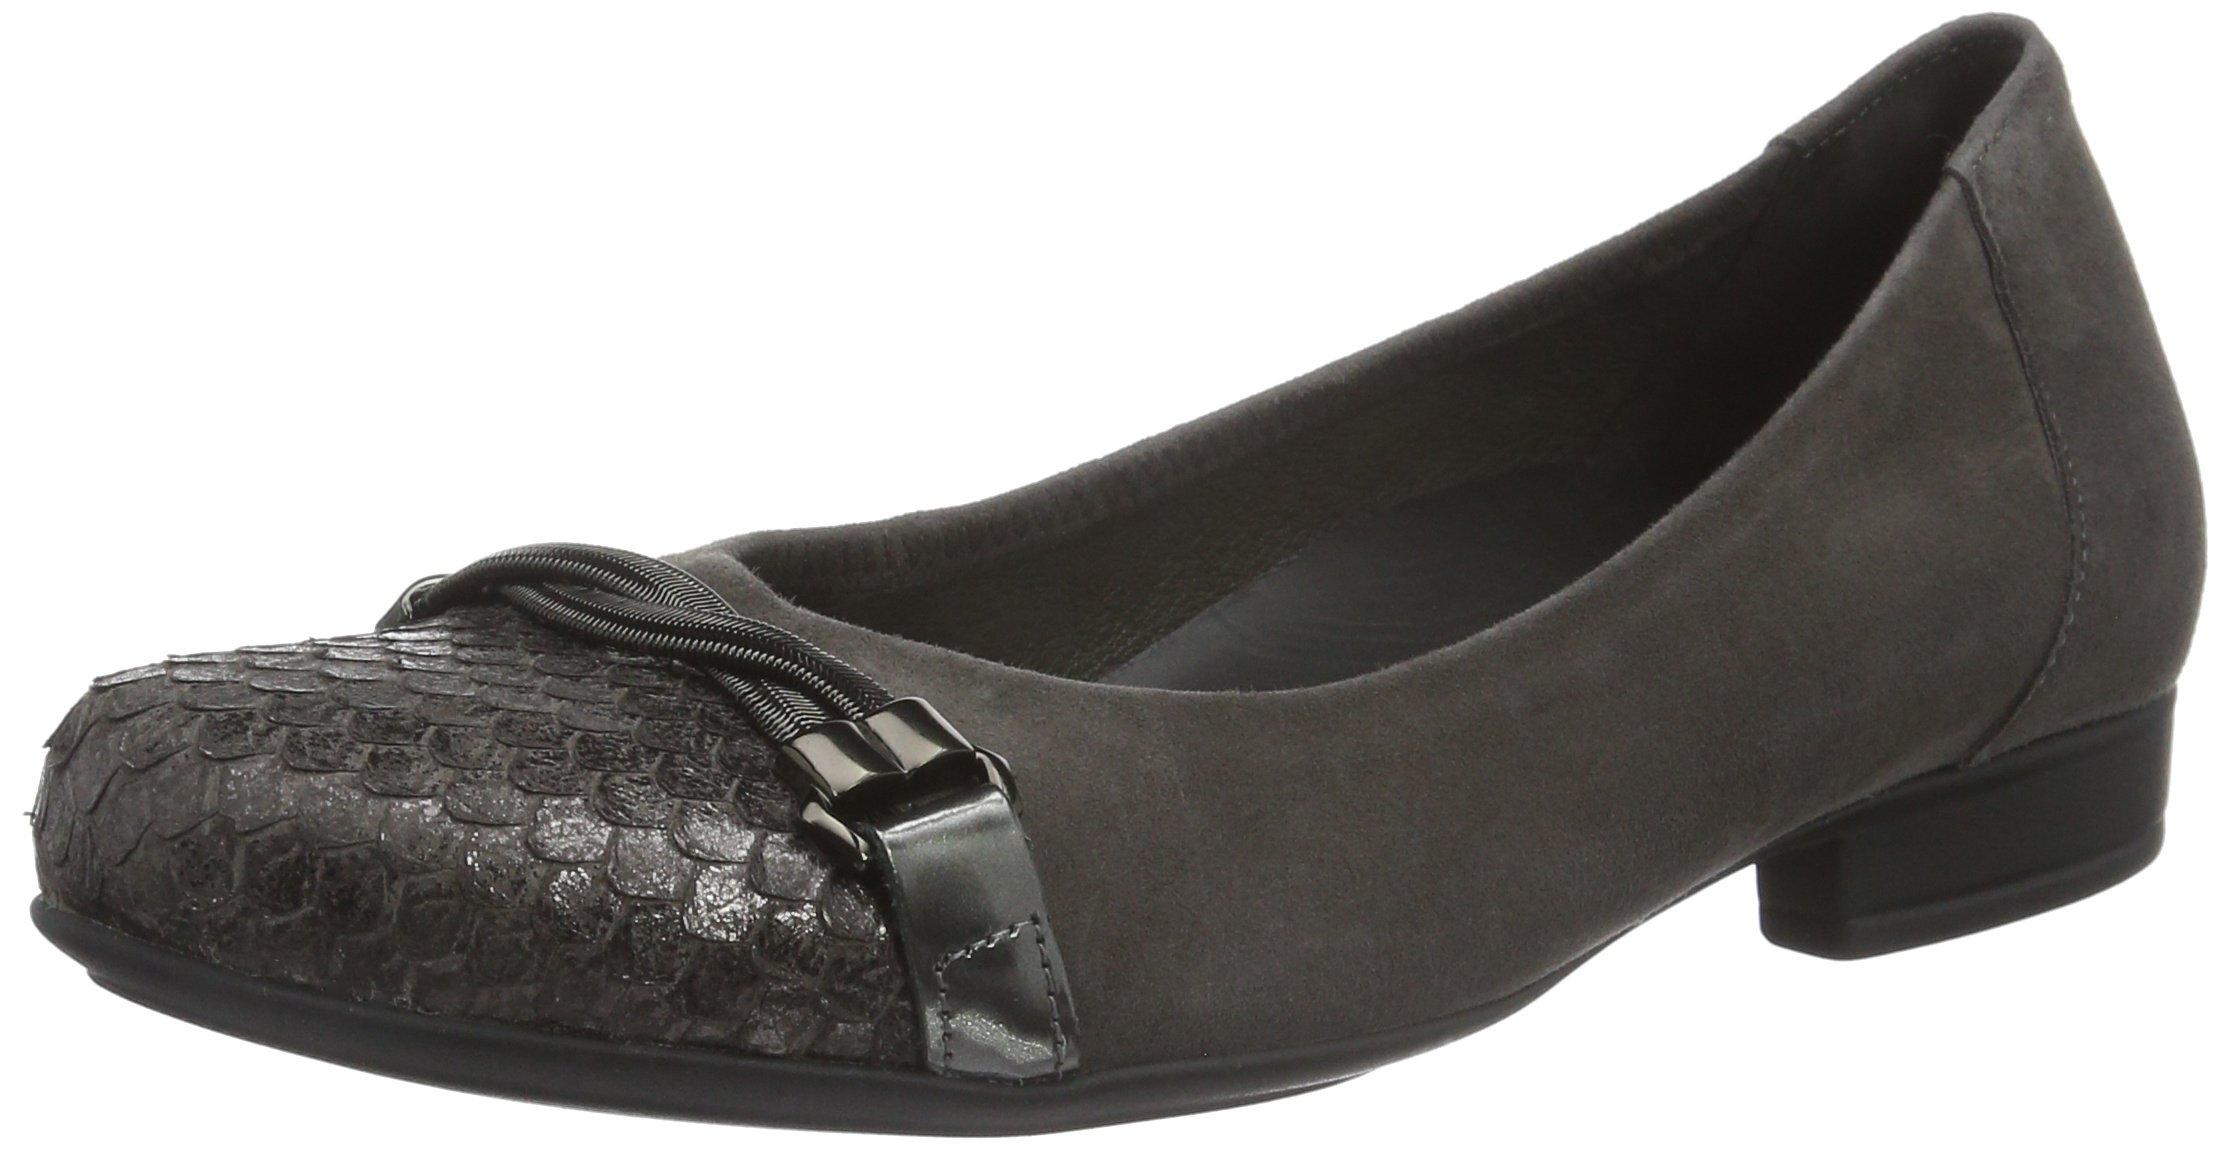 Gabor FemmeGris39 Shoes 635 52 Eu Ballerines qVSMGUzp